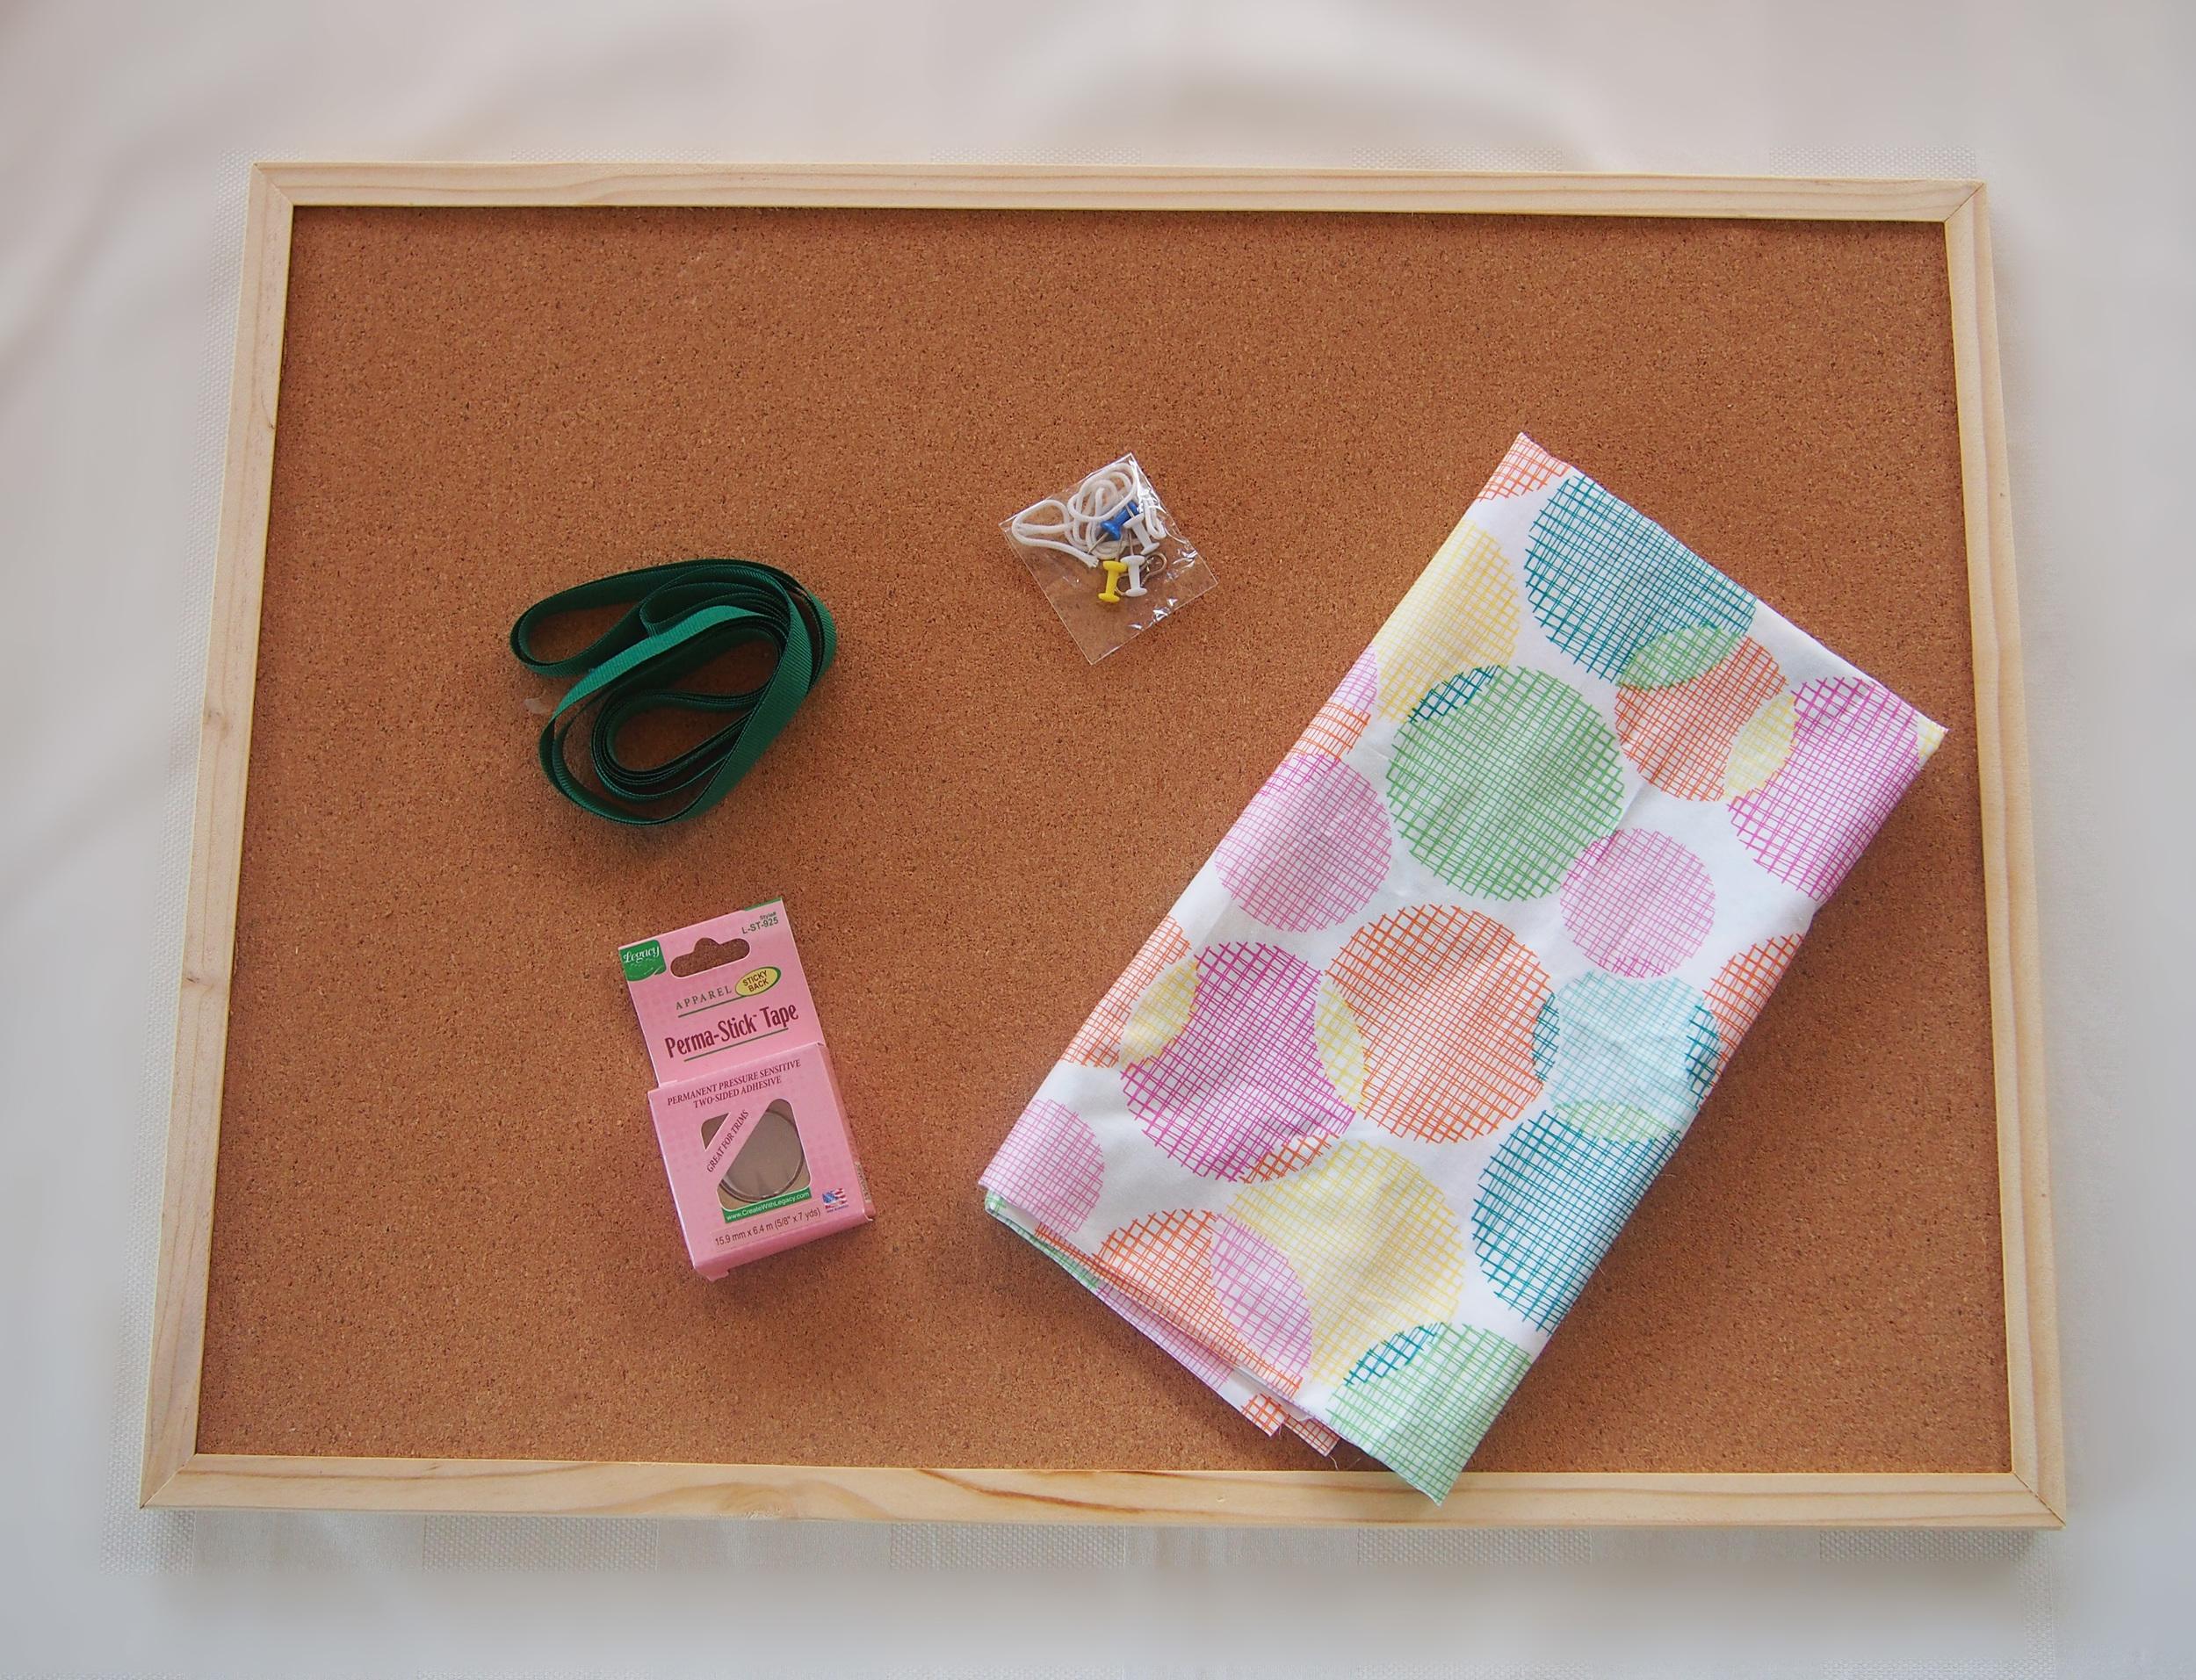 materials to cover cork board